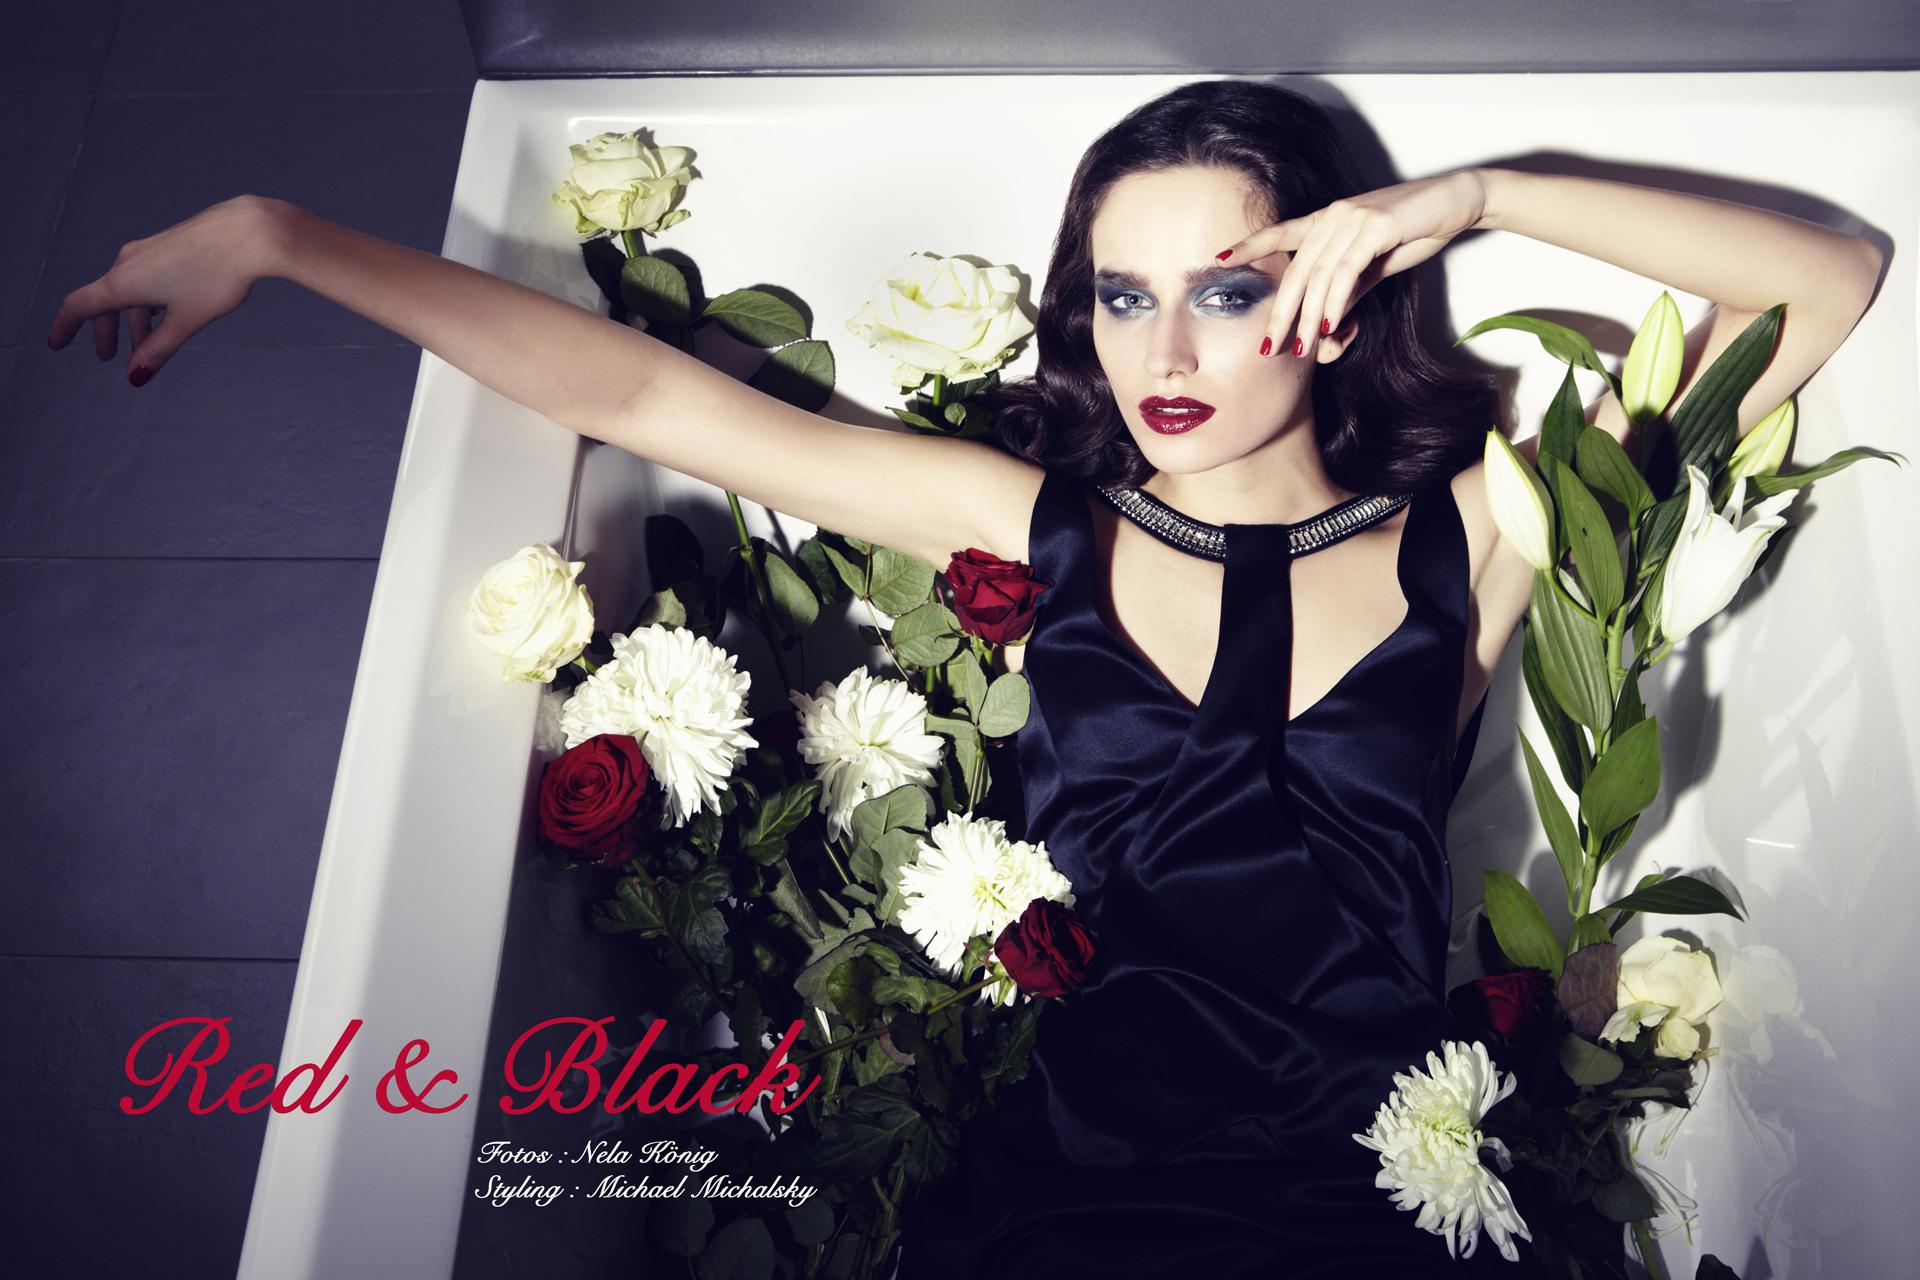 Red&Black1.jpg